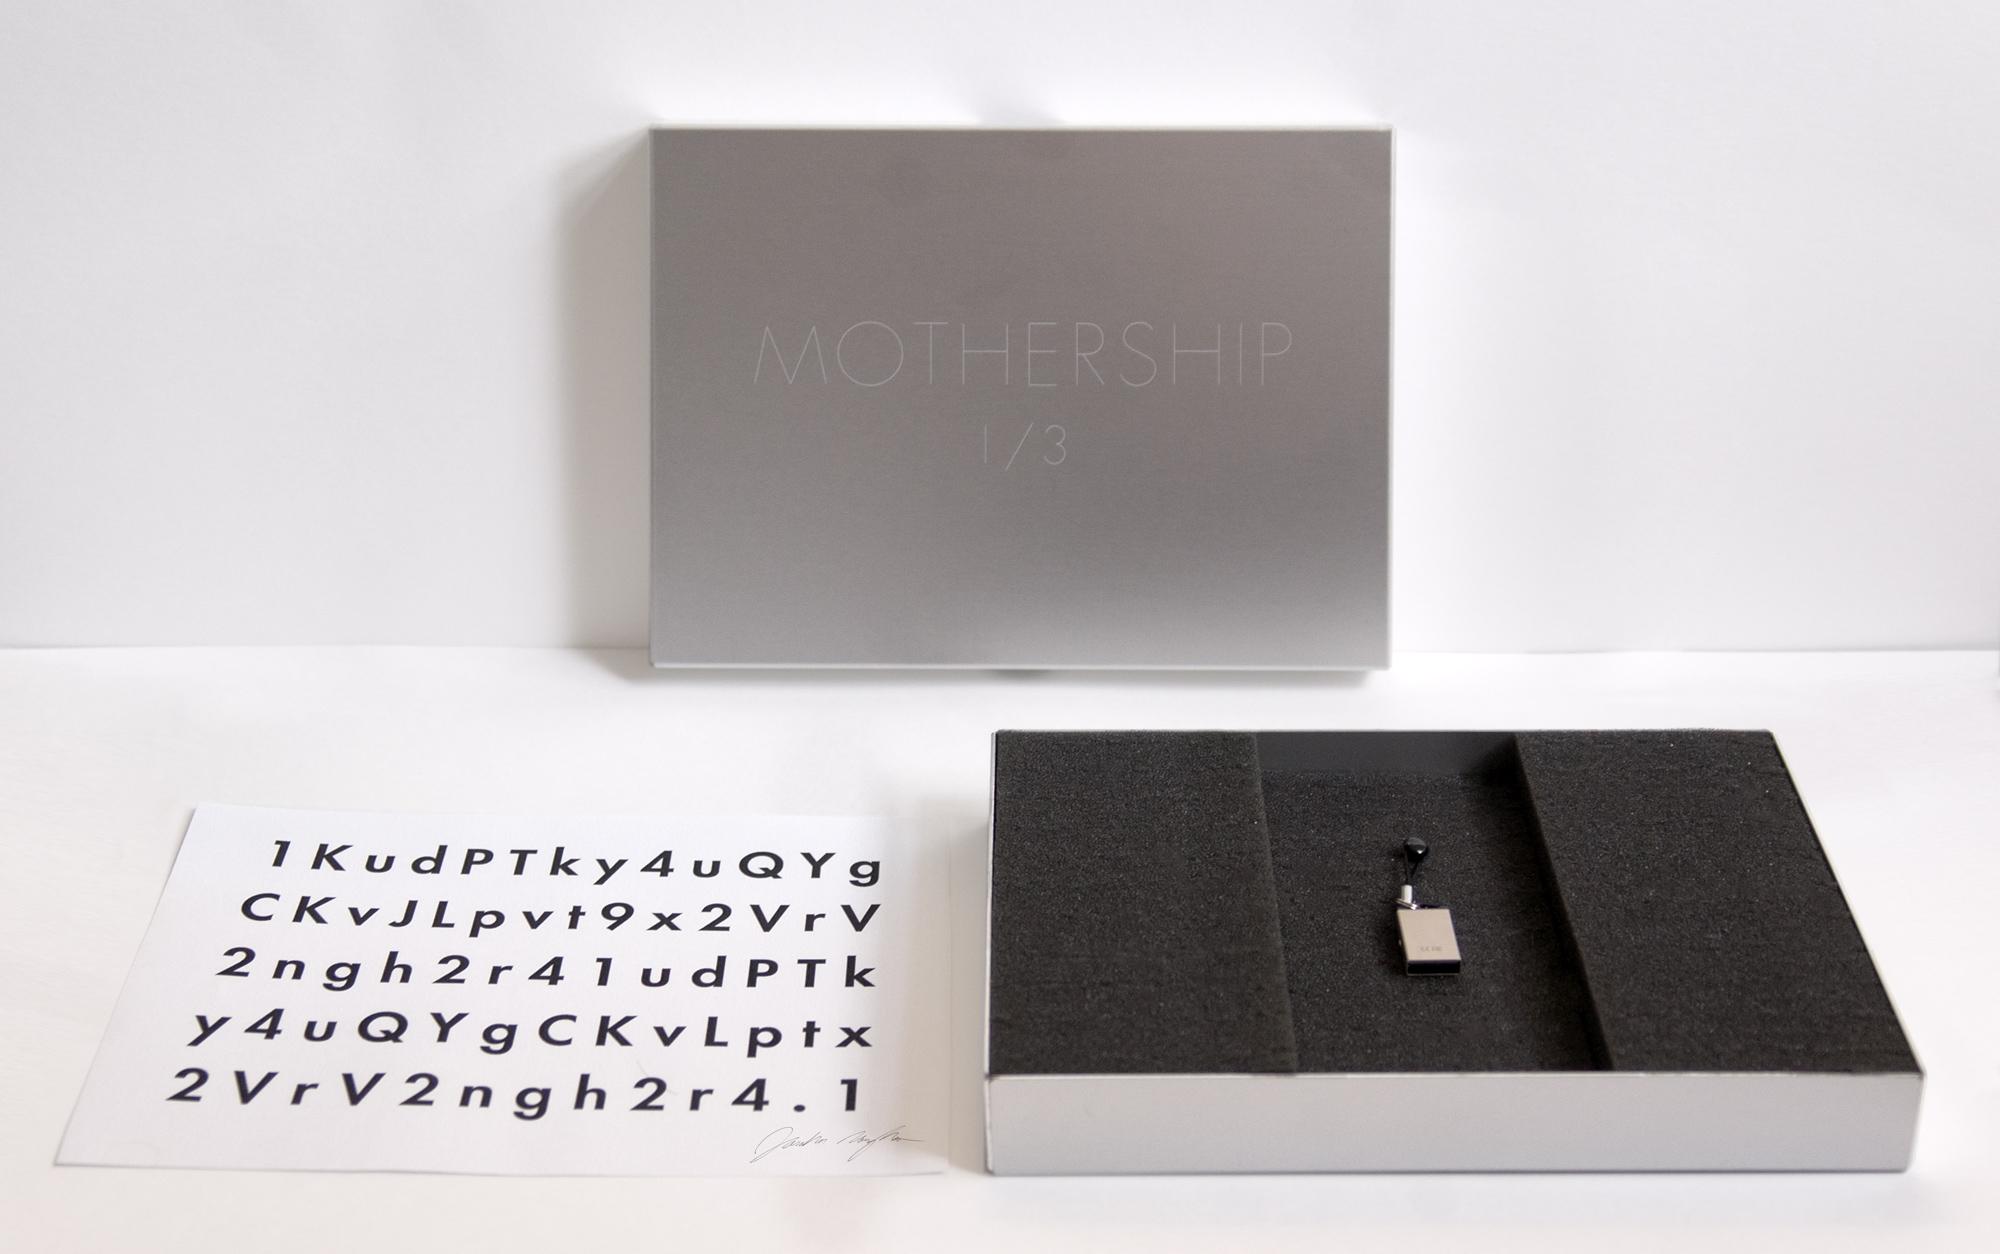 Jonathan Monaghan  Mothership ,2013 CGI animated HD film, 15 min loop, edition of 3 with laser-etched aluminum case, USB, Keidom ID  Music by Evan Samek